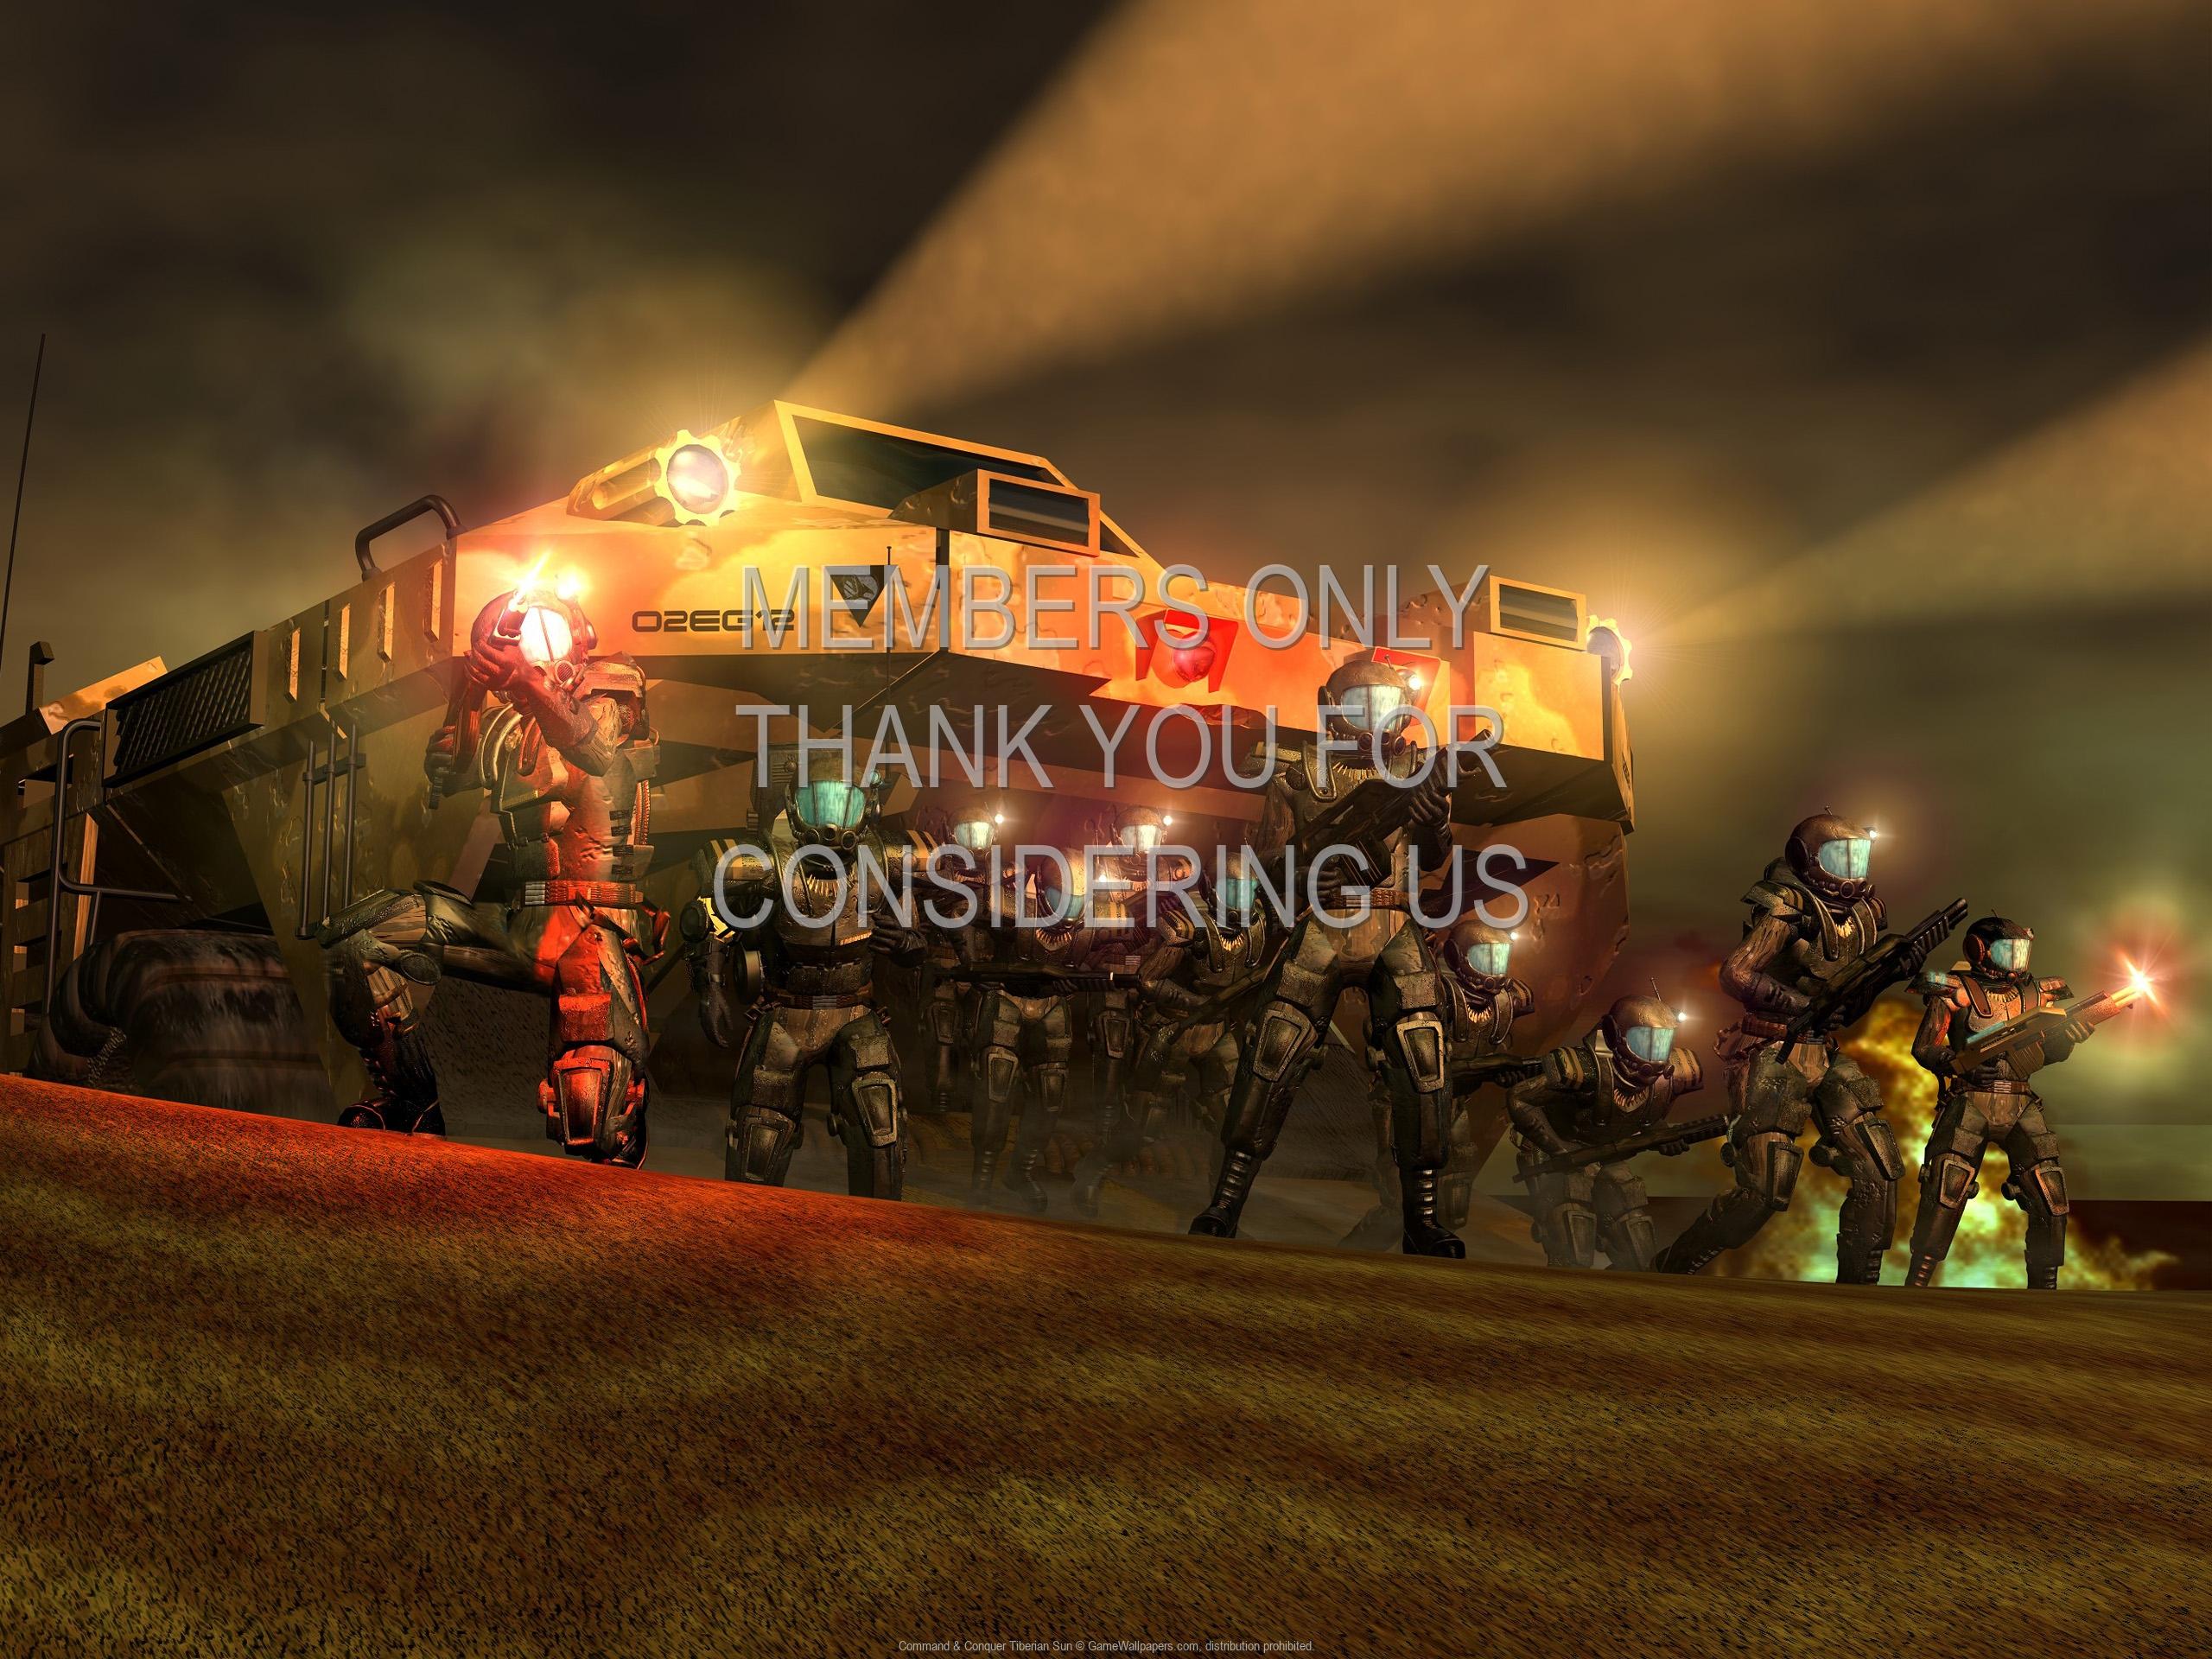 Command & Conquer: Tiberian Sun 1920x1080 Handy Hintergrundbild 02